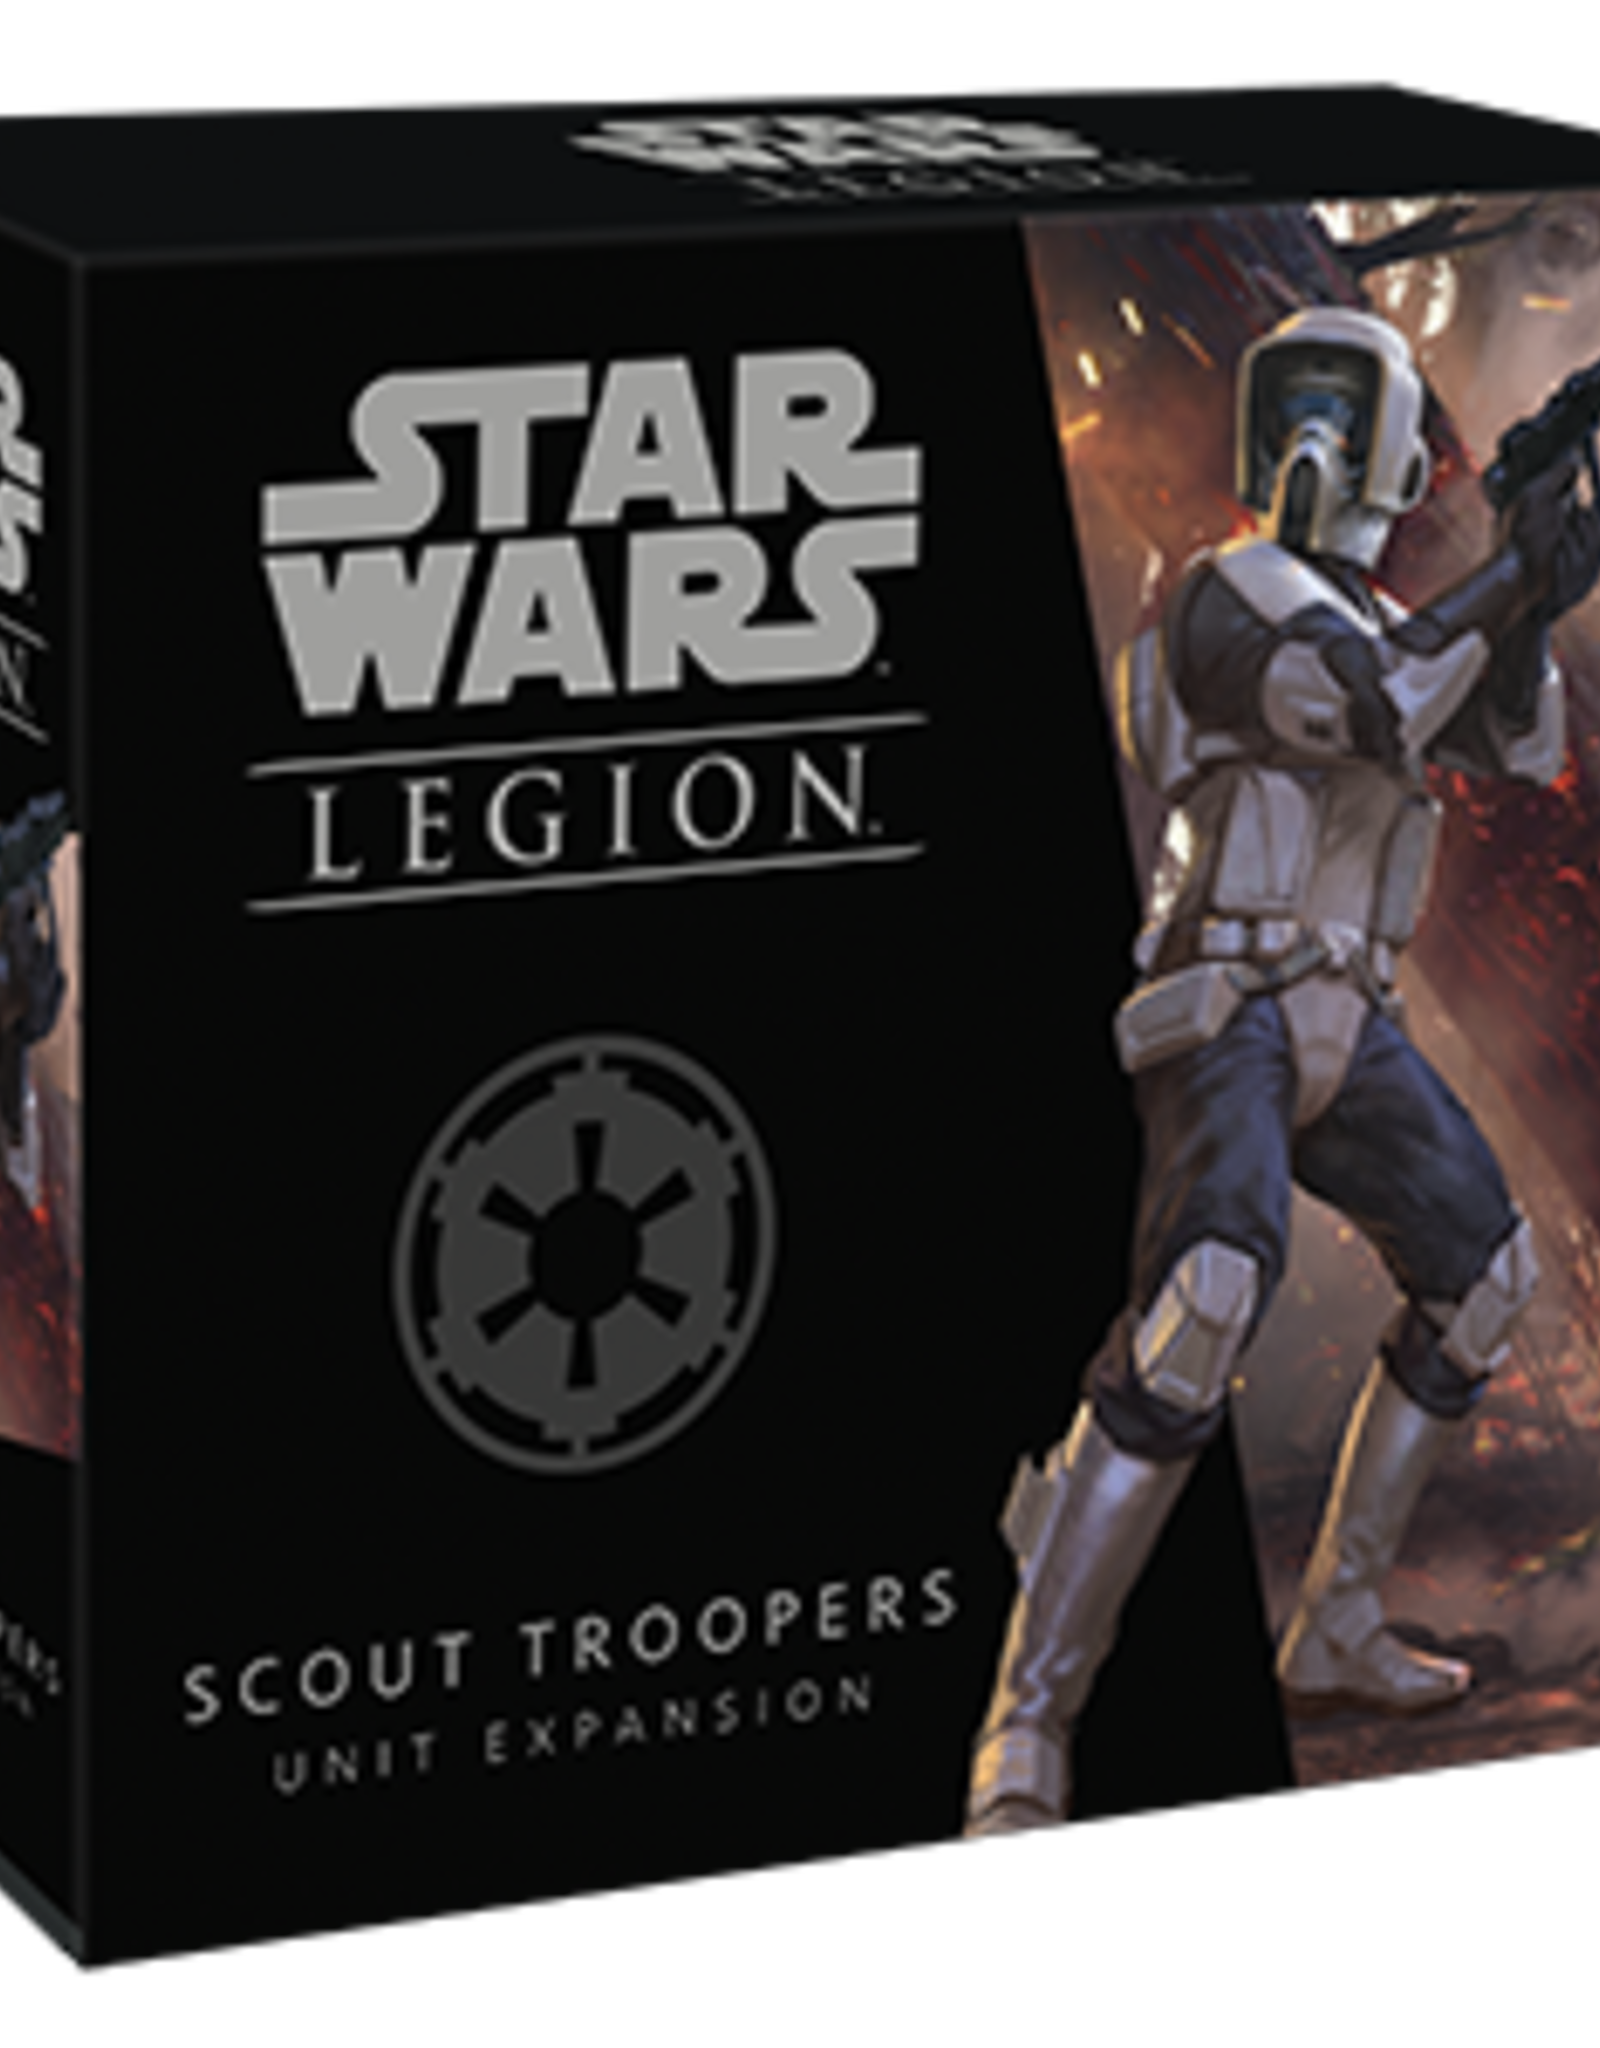 FFG Star Wars Legion: Imperial Scout Trooper Unit Expansion